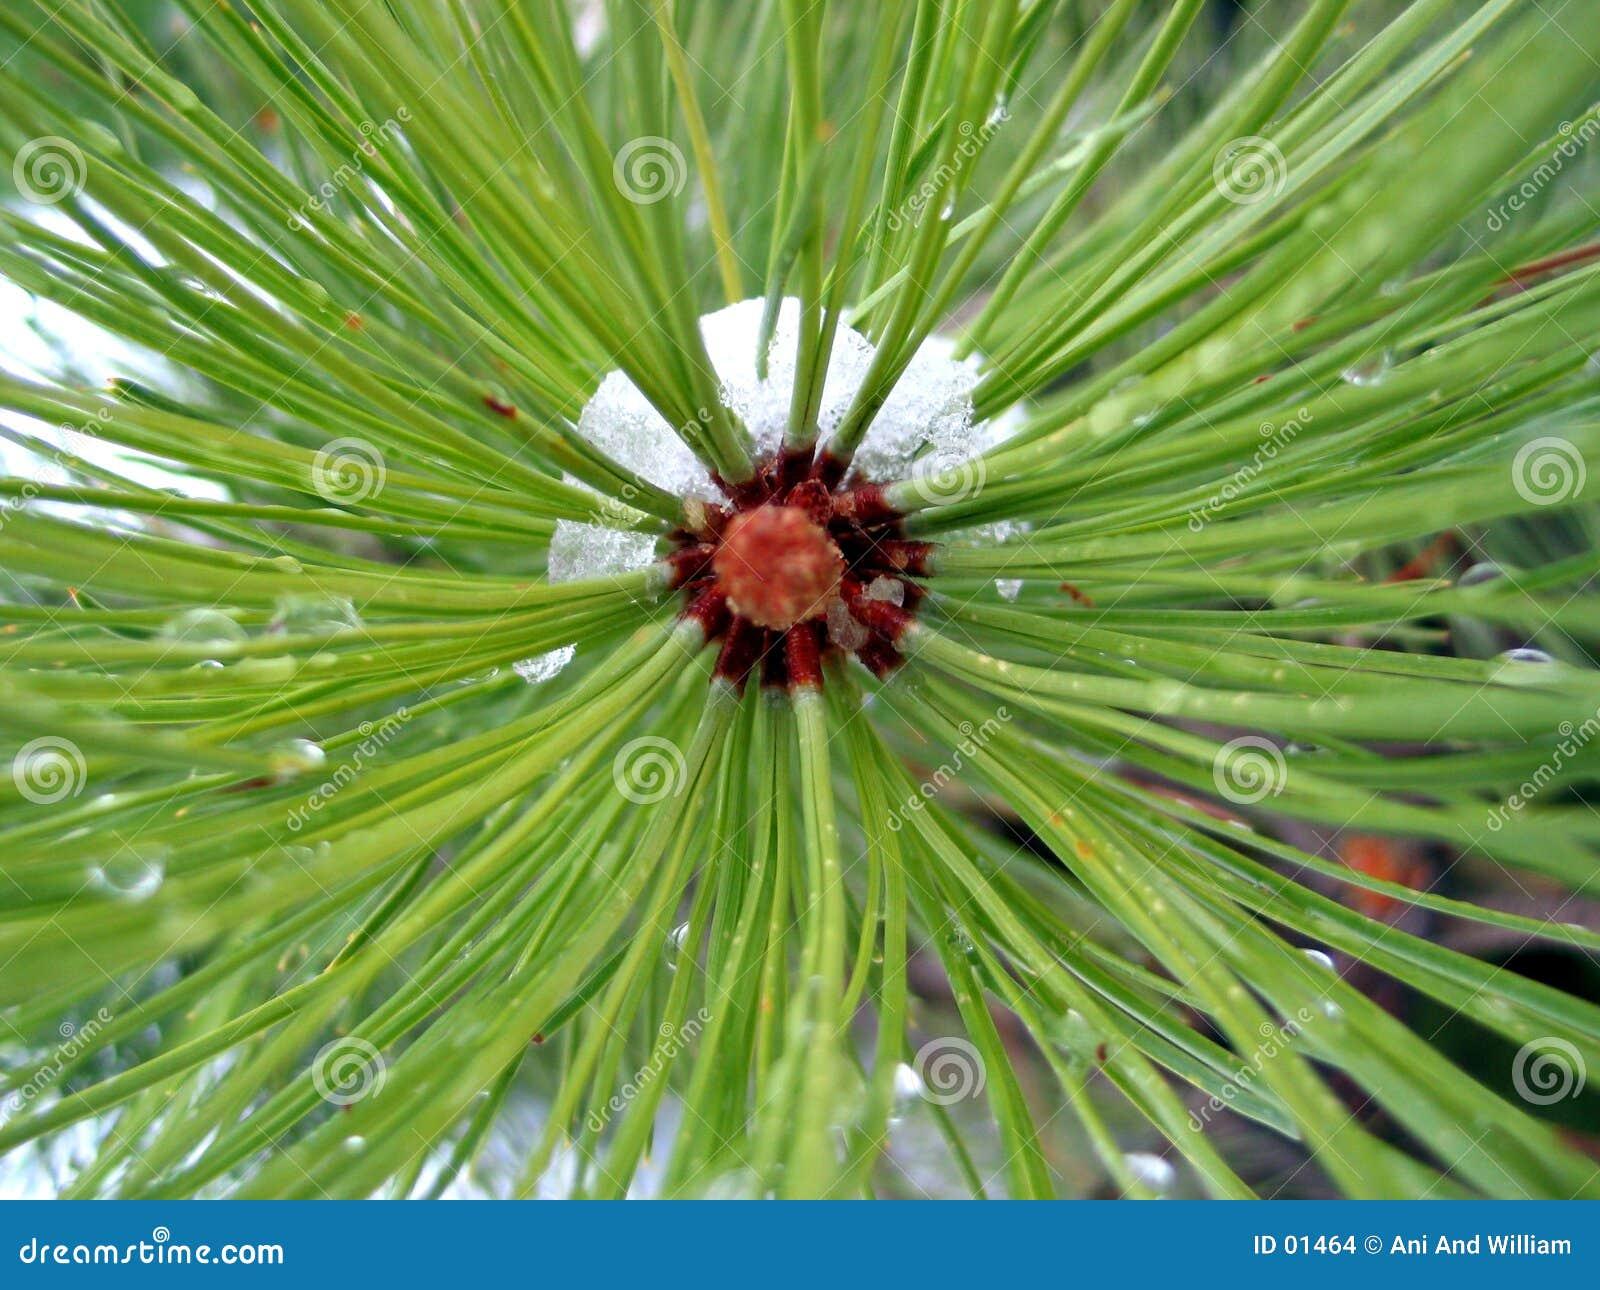 Center pine zone